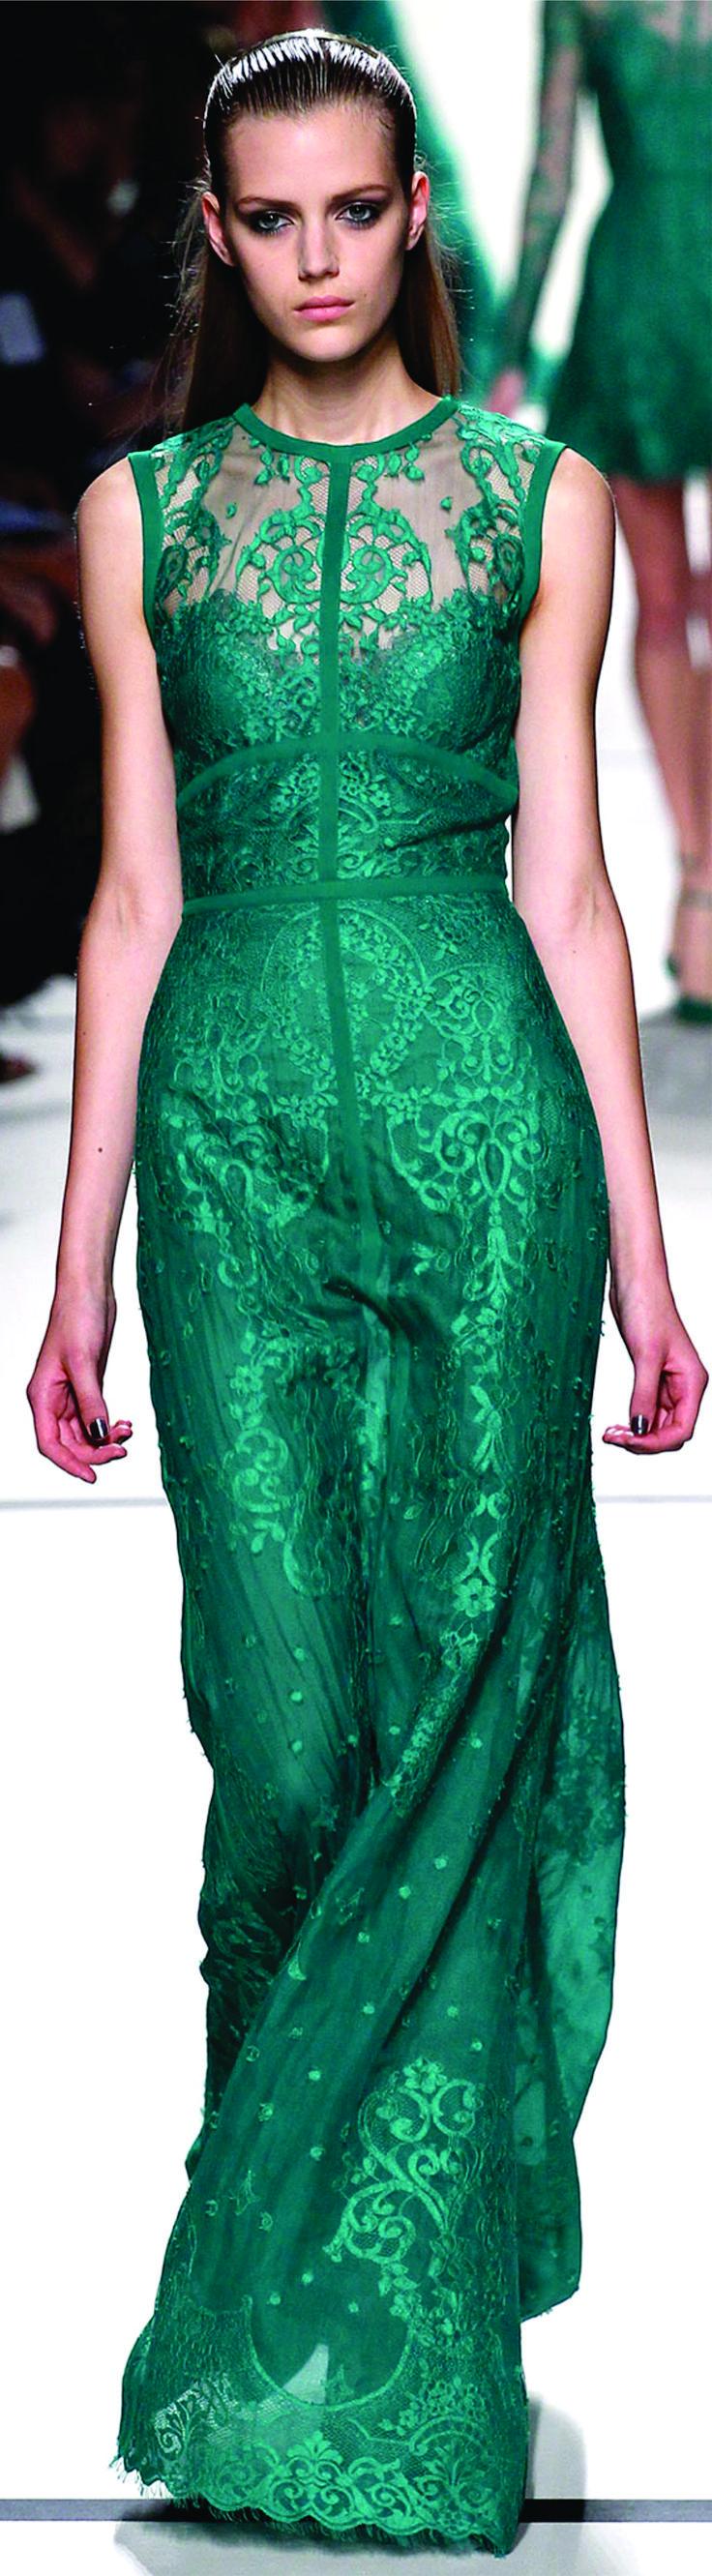 182 best Elie Saab... images on Pinterest | Evening gowns ...